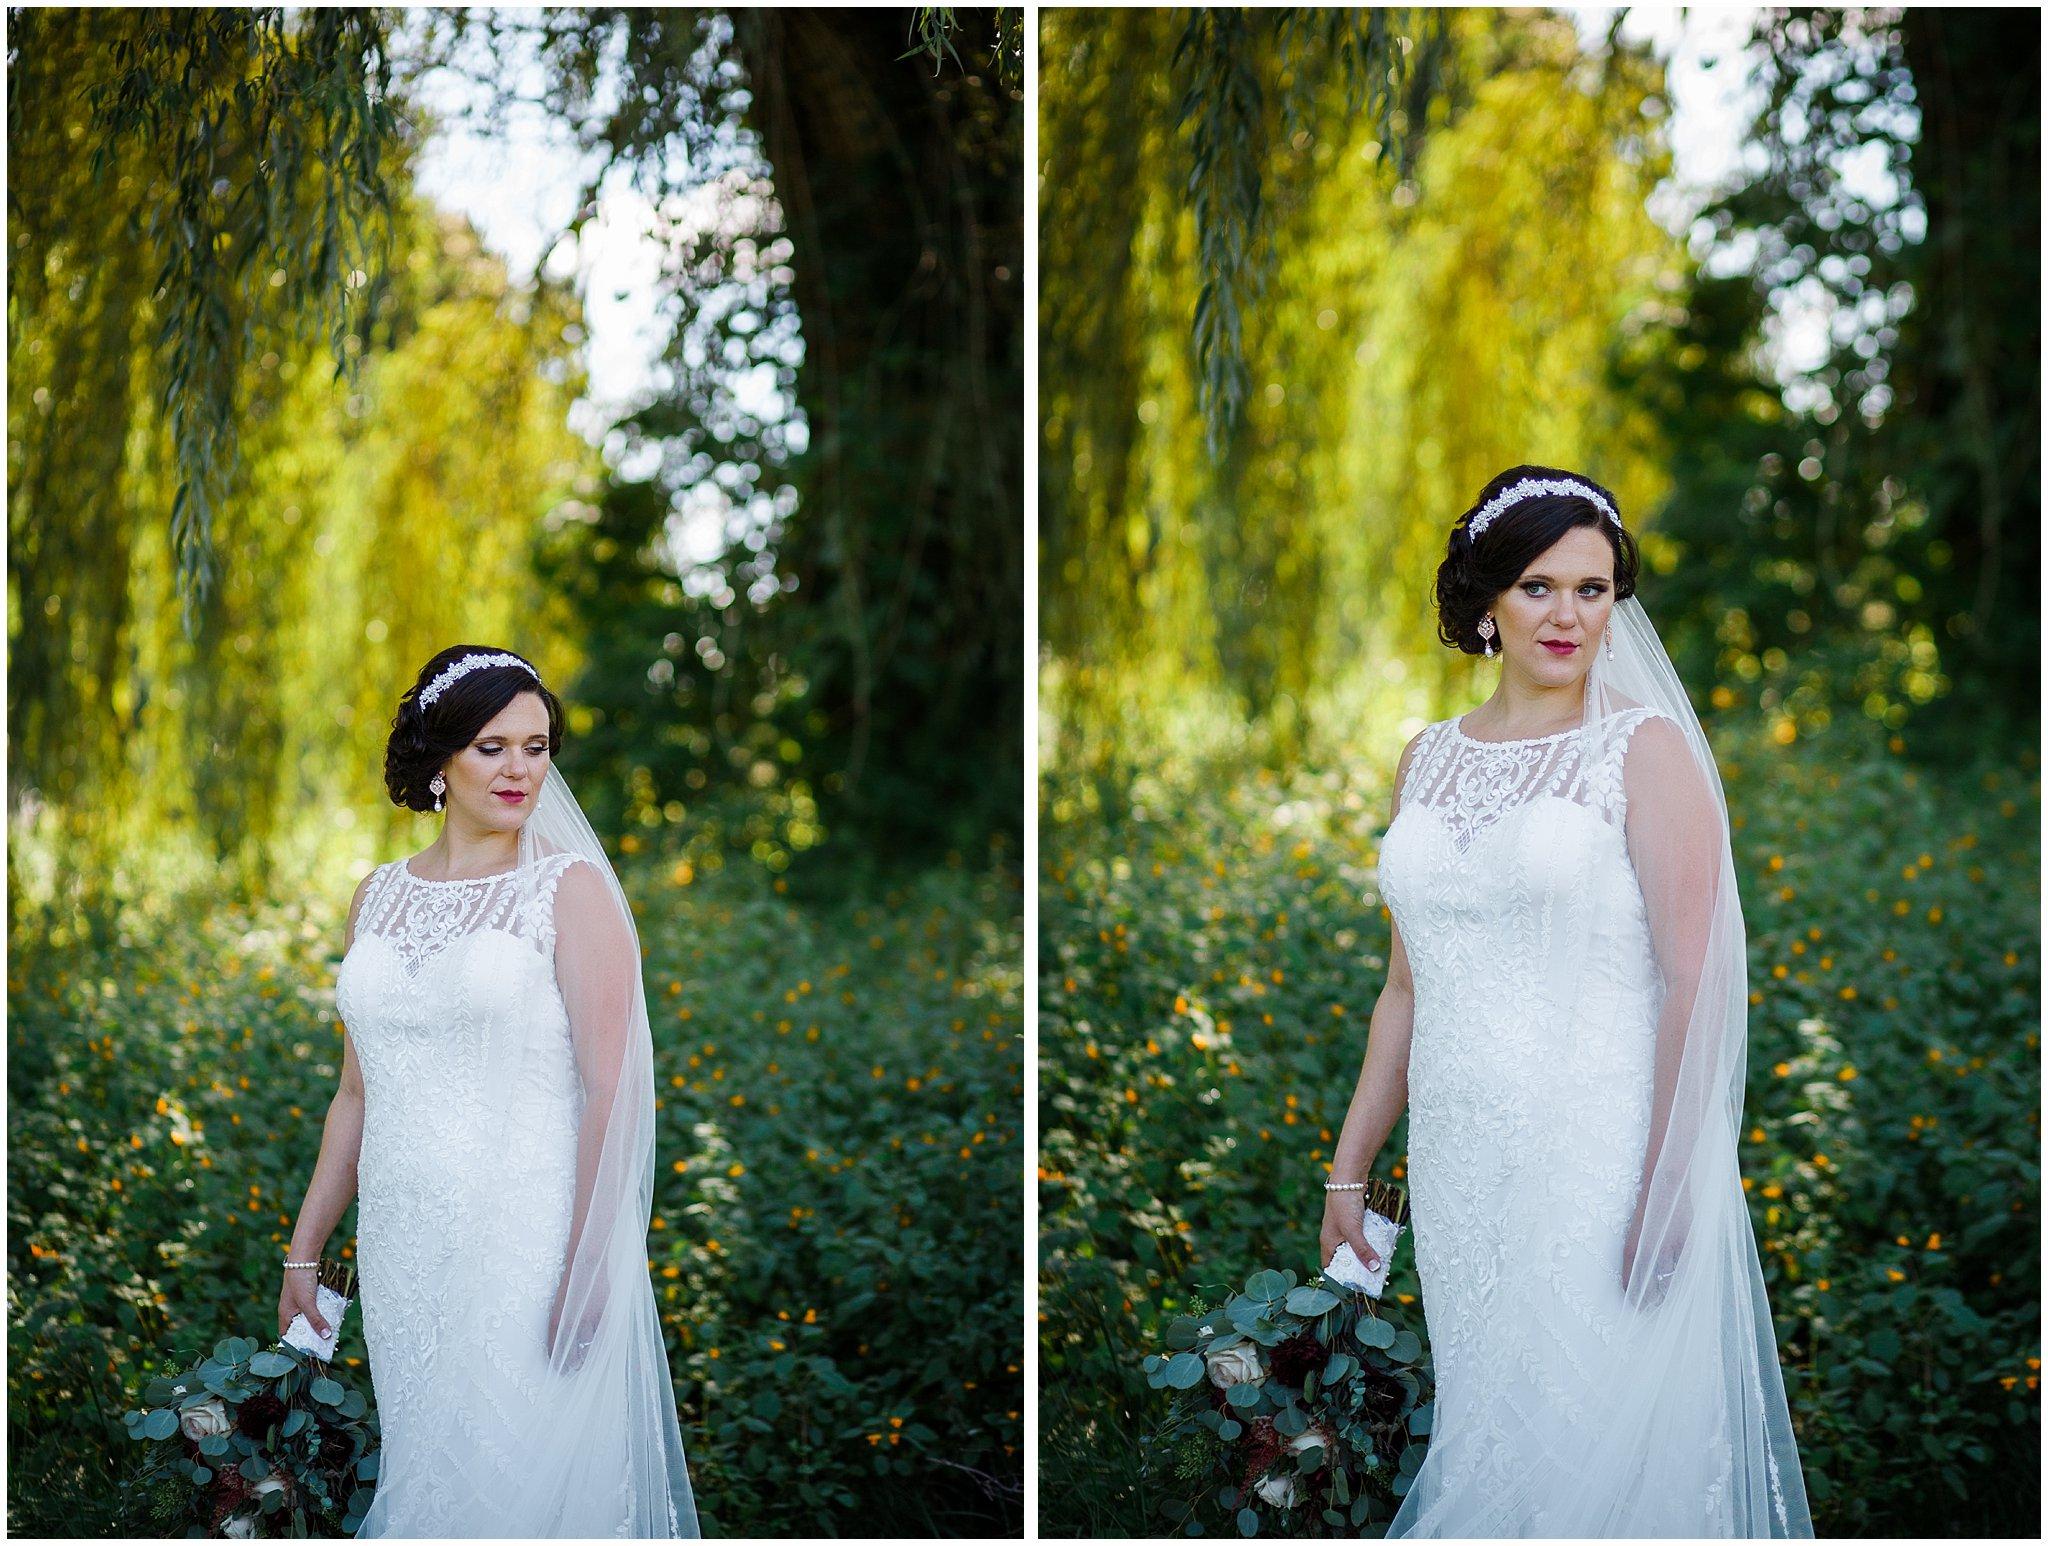 West Hills Country Club Wedding Gatsby Wedding Roaring Twenties Wedding Hudson Valley Wedding Photographer Sweet Alice Photography40.jpg